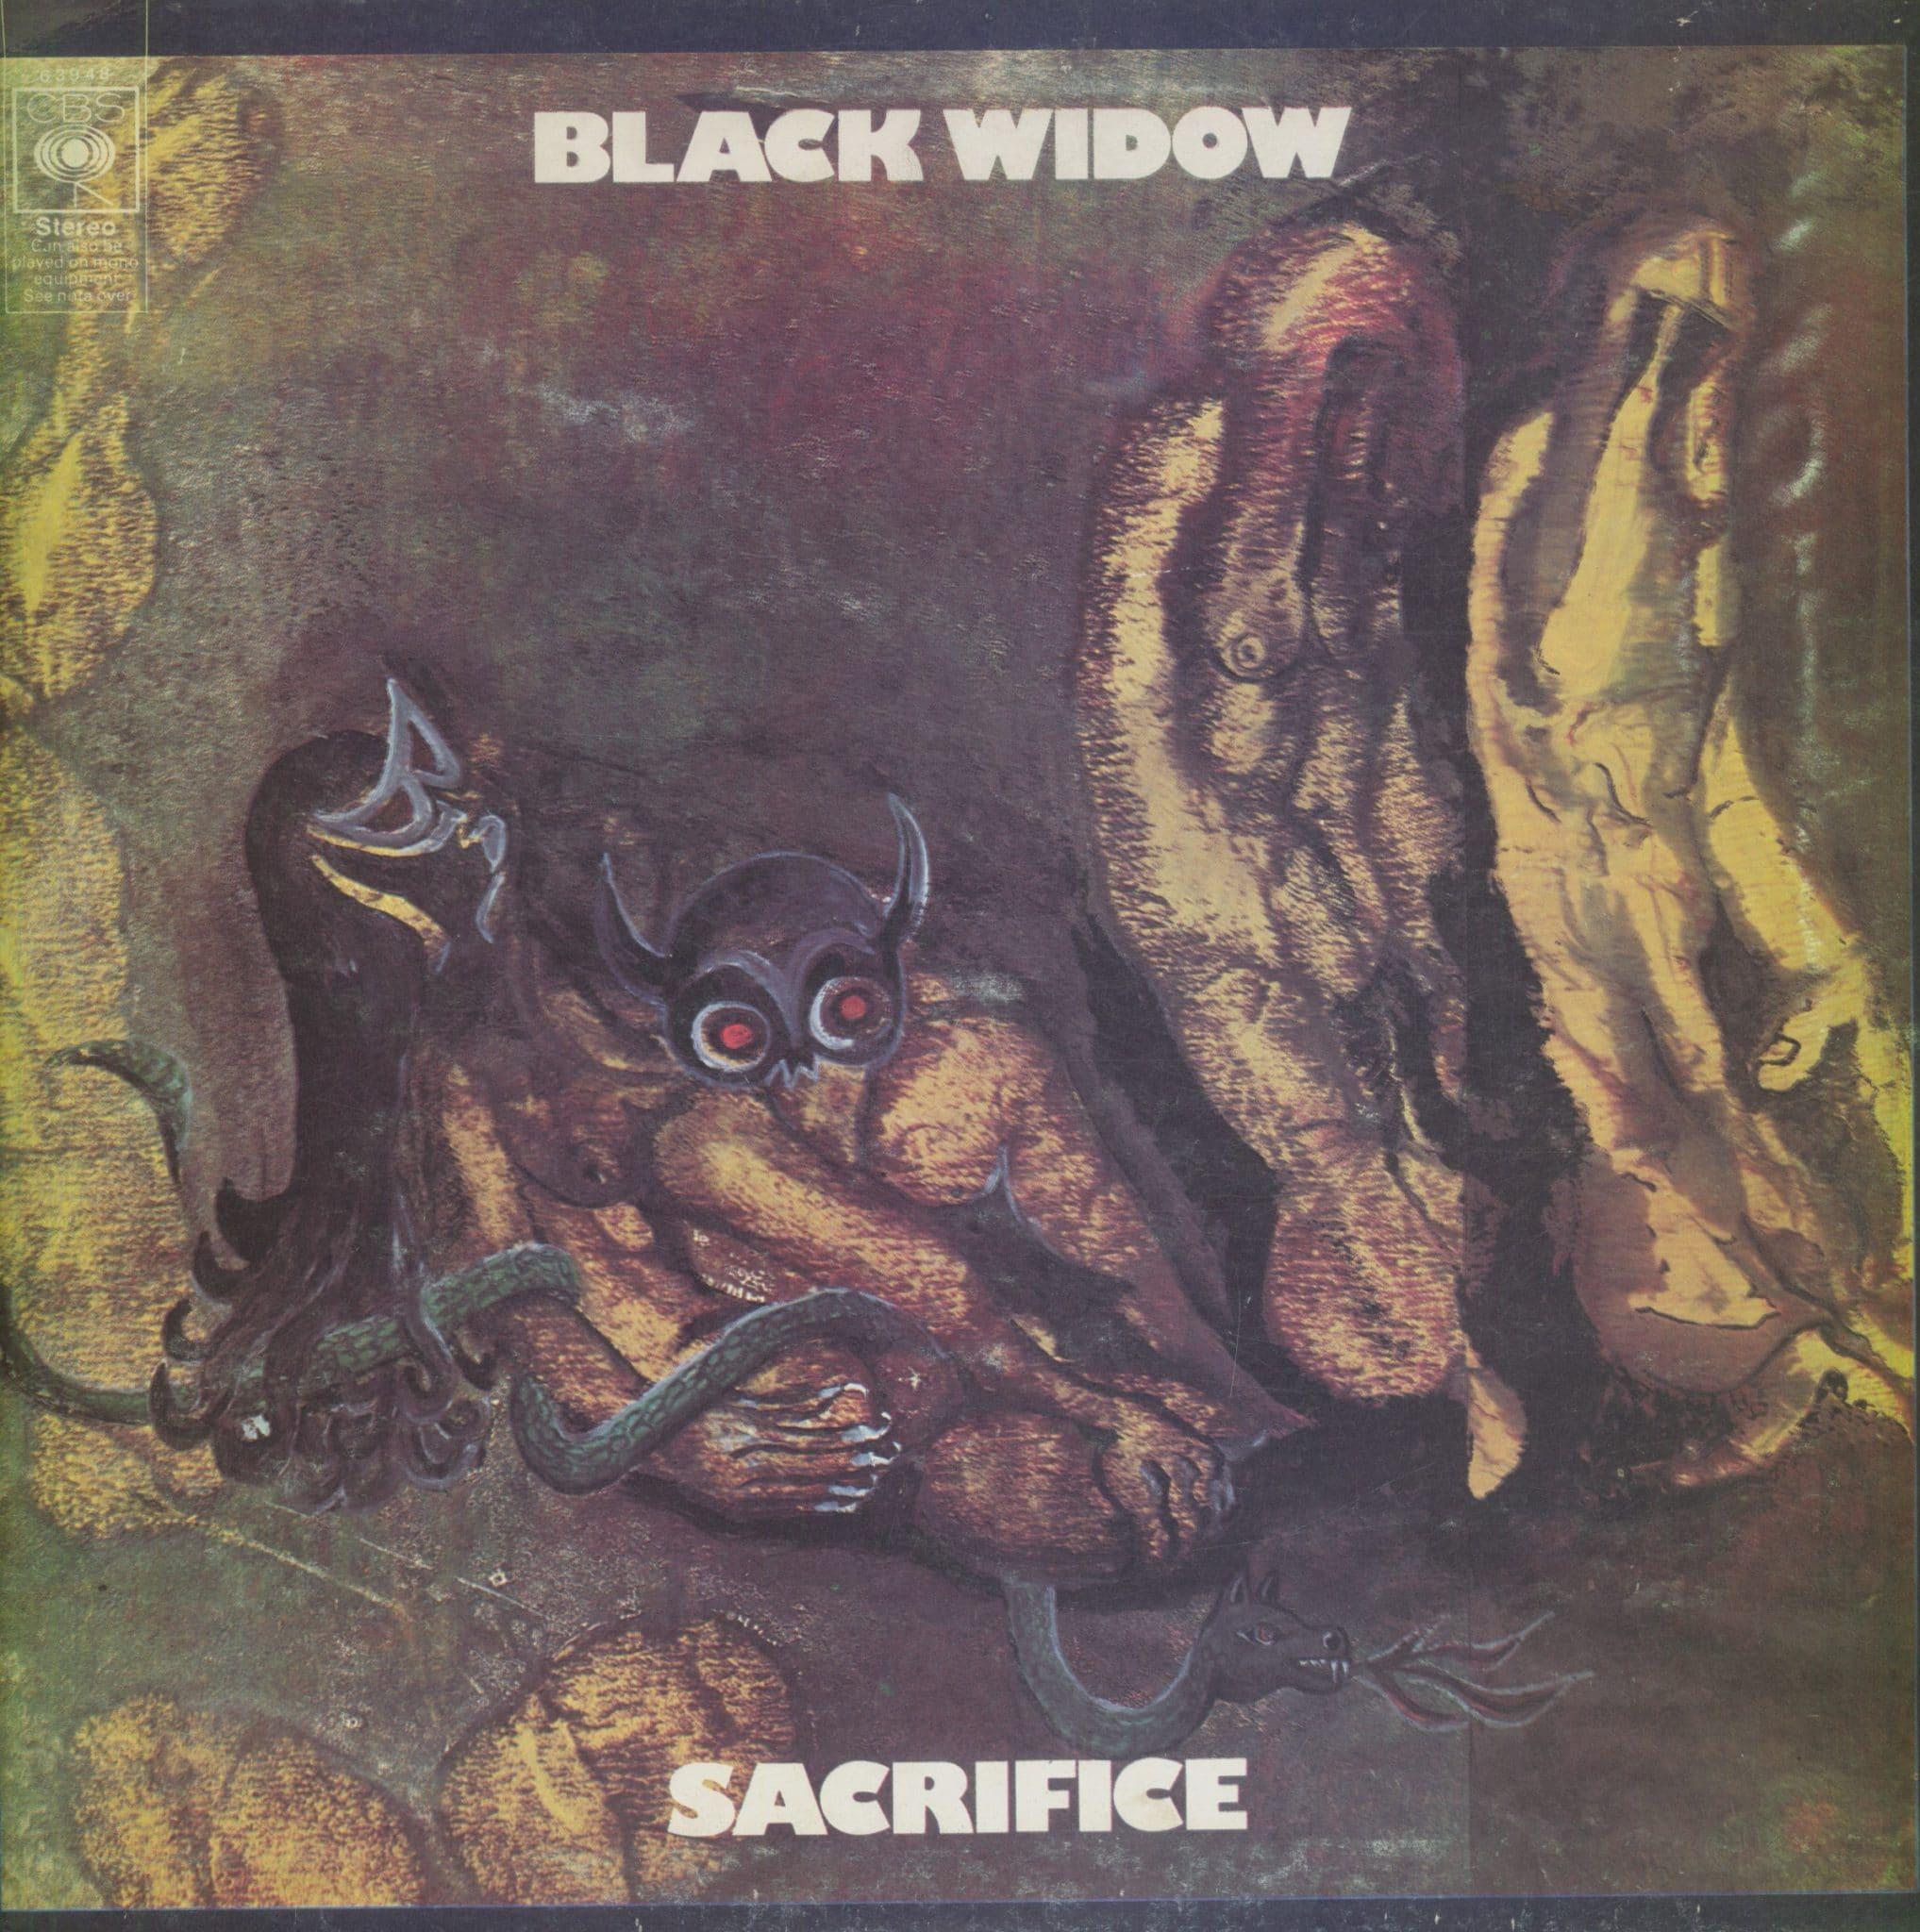 Gramofonska ploča Black Widow Sacrifice 63948